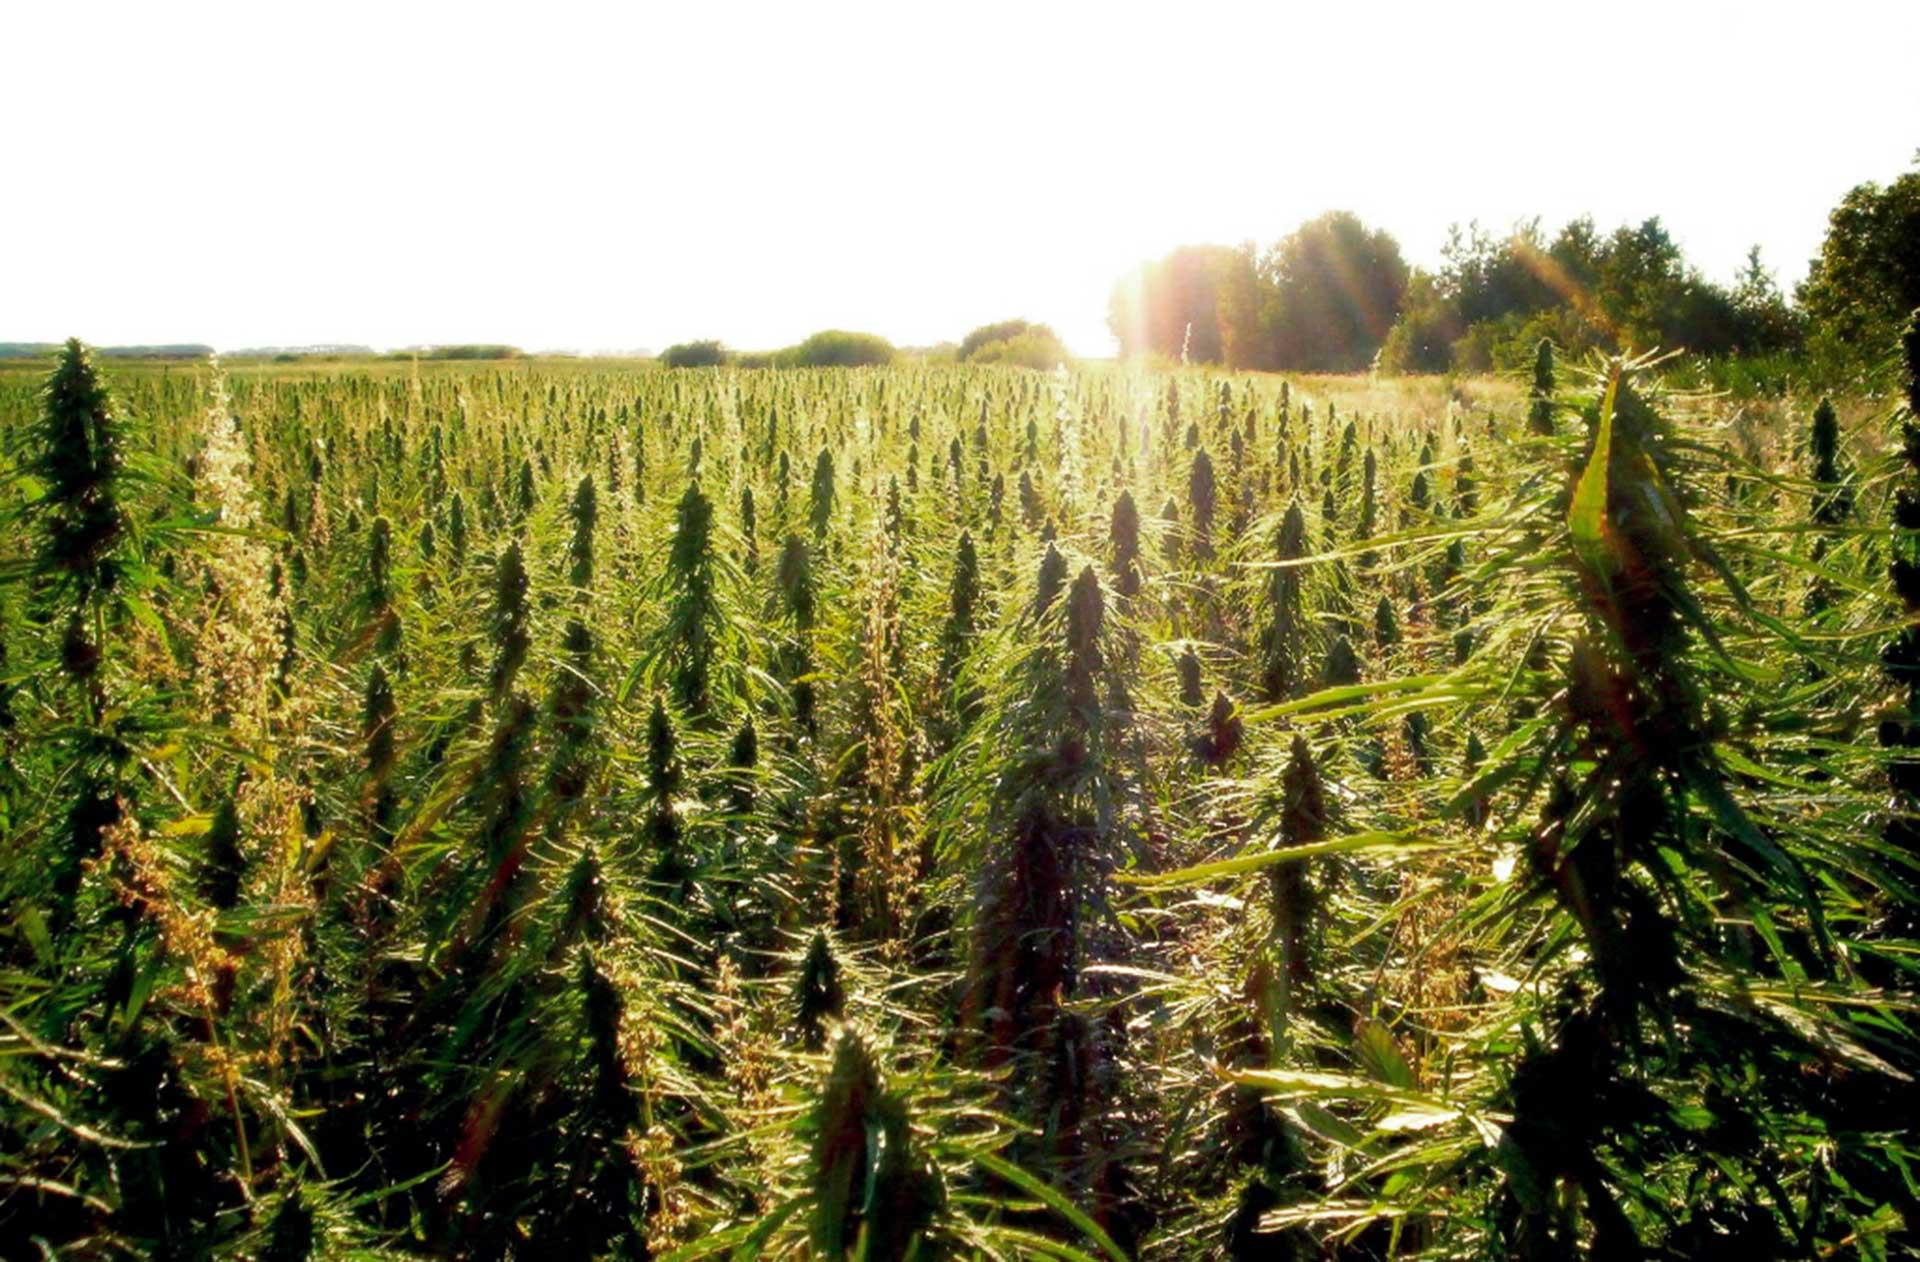 Hemp: A new crop for Missouri farmers?